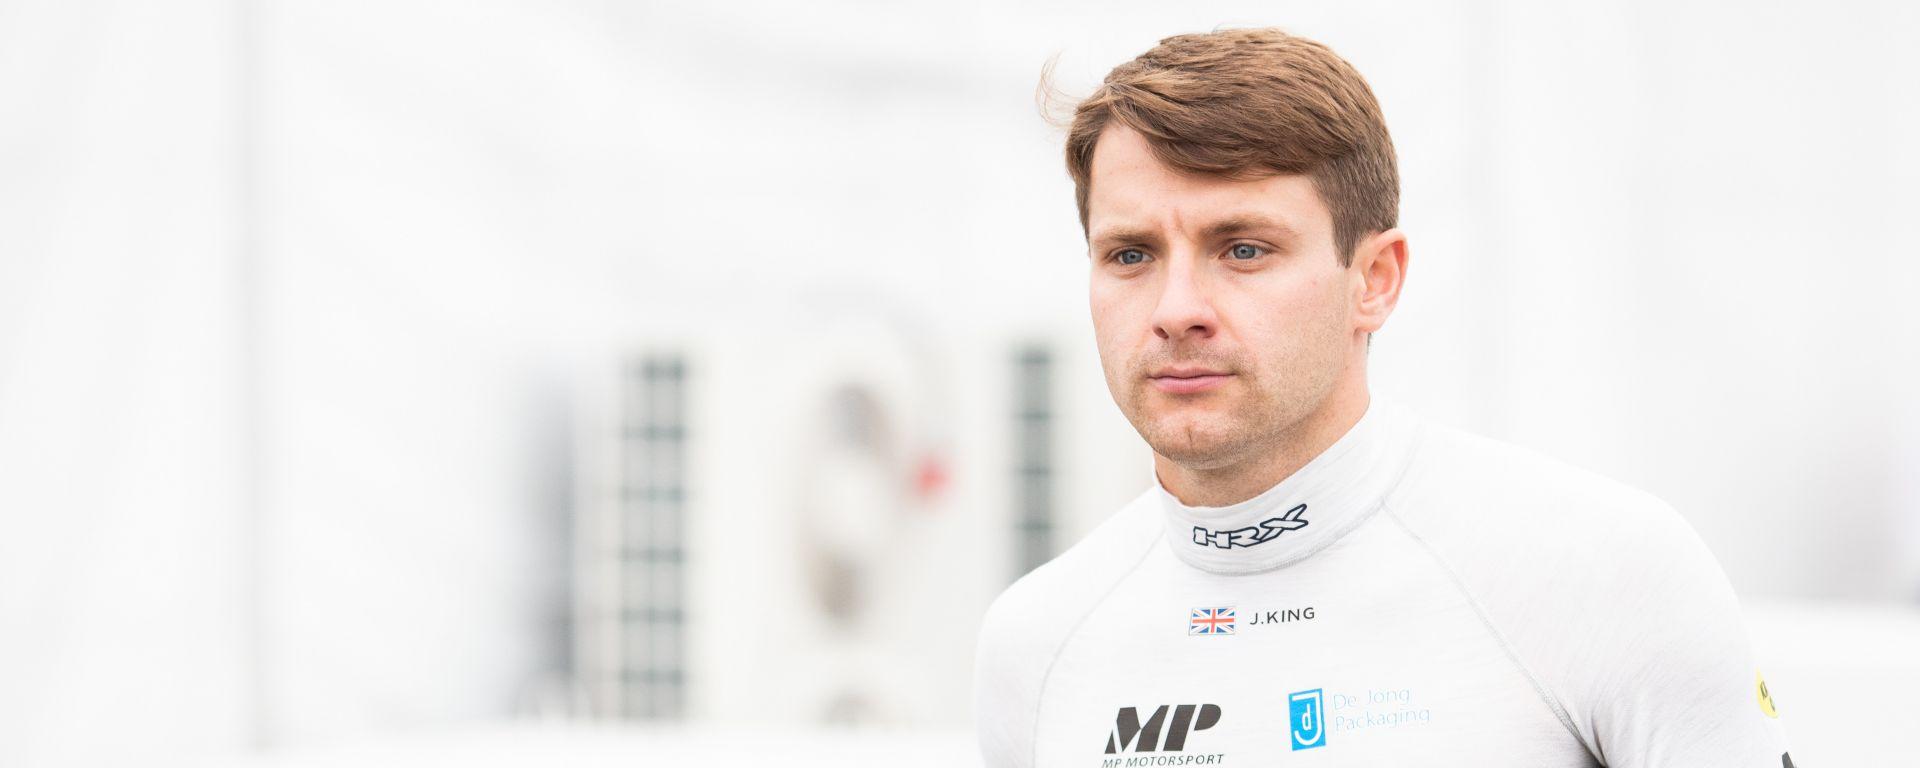 Fia Formula 2 2019, Jordan King